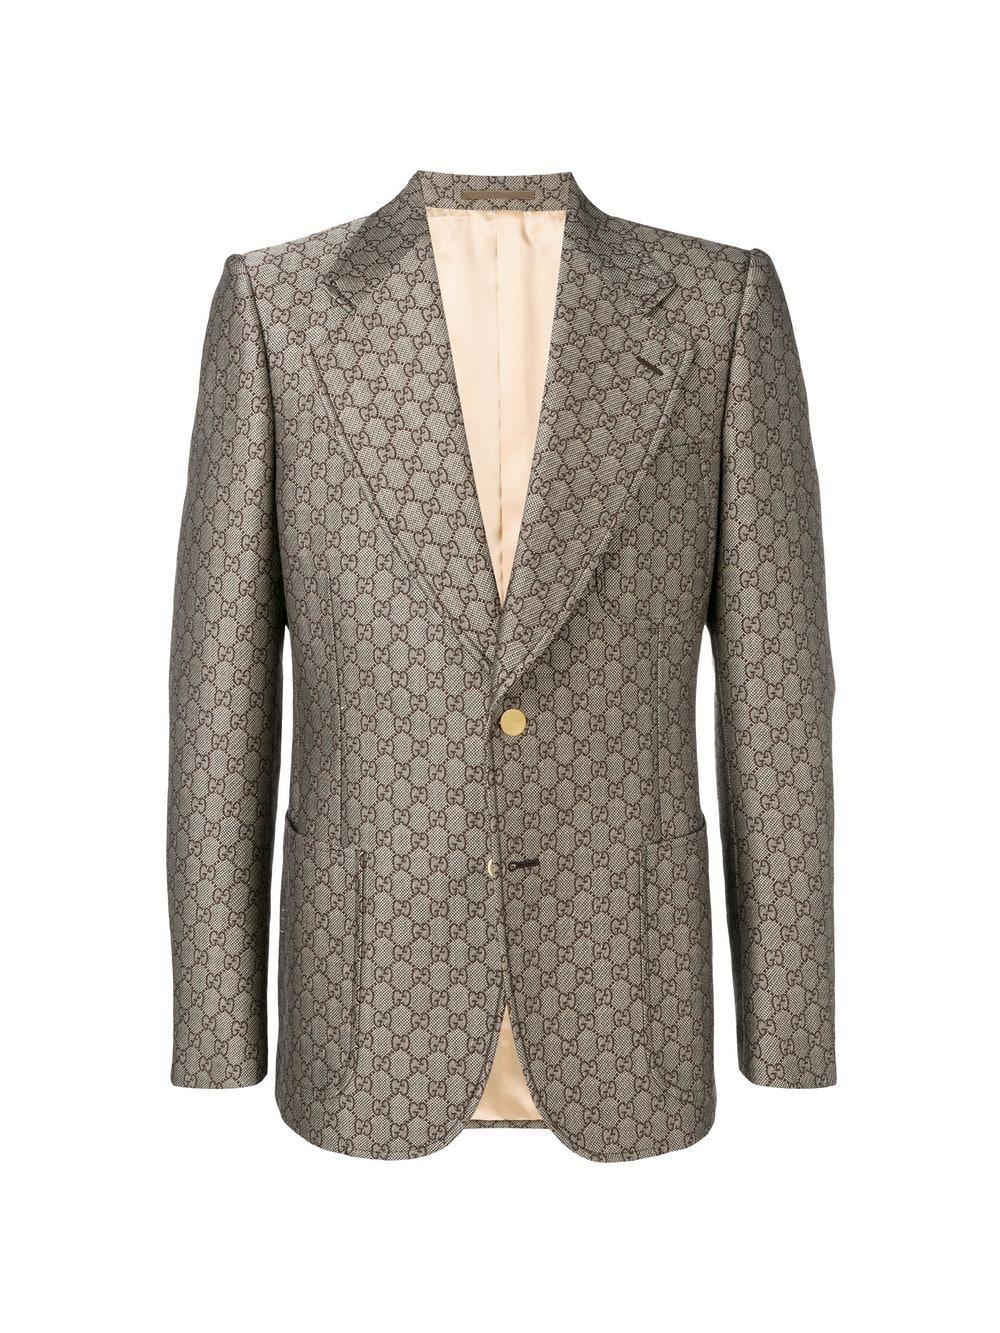 9ed9f88af Gucci GG Wool Blend Logo Blazer in Brown for Men - Save 11% - Lyst